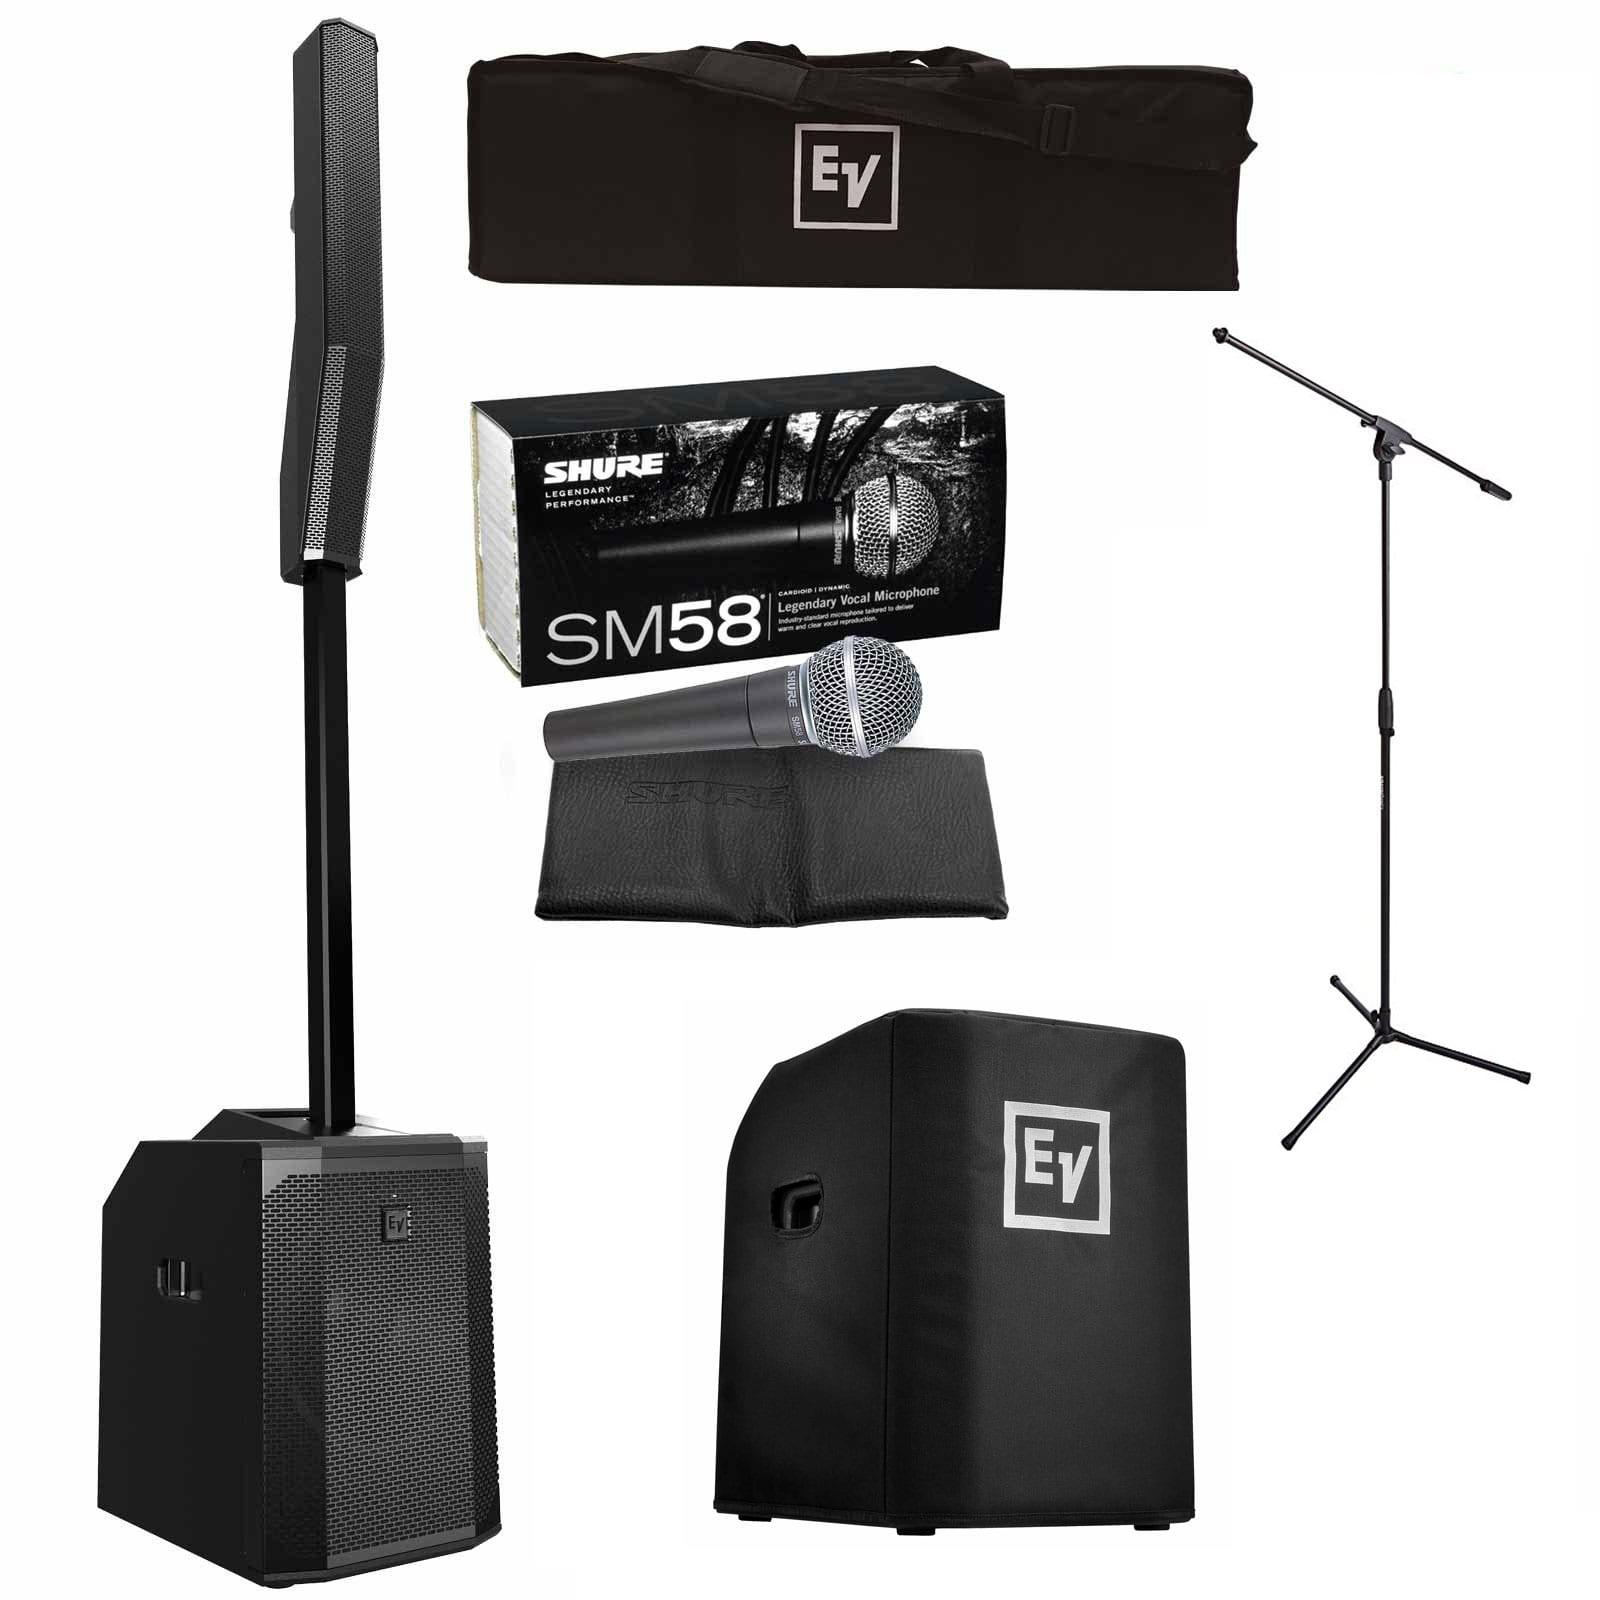 electro voice evolve 50 portable column bluetooth pa system package prosoundgear. Black Bedroom Furniture Sets. Home Design Ideas